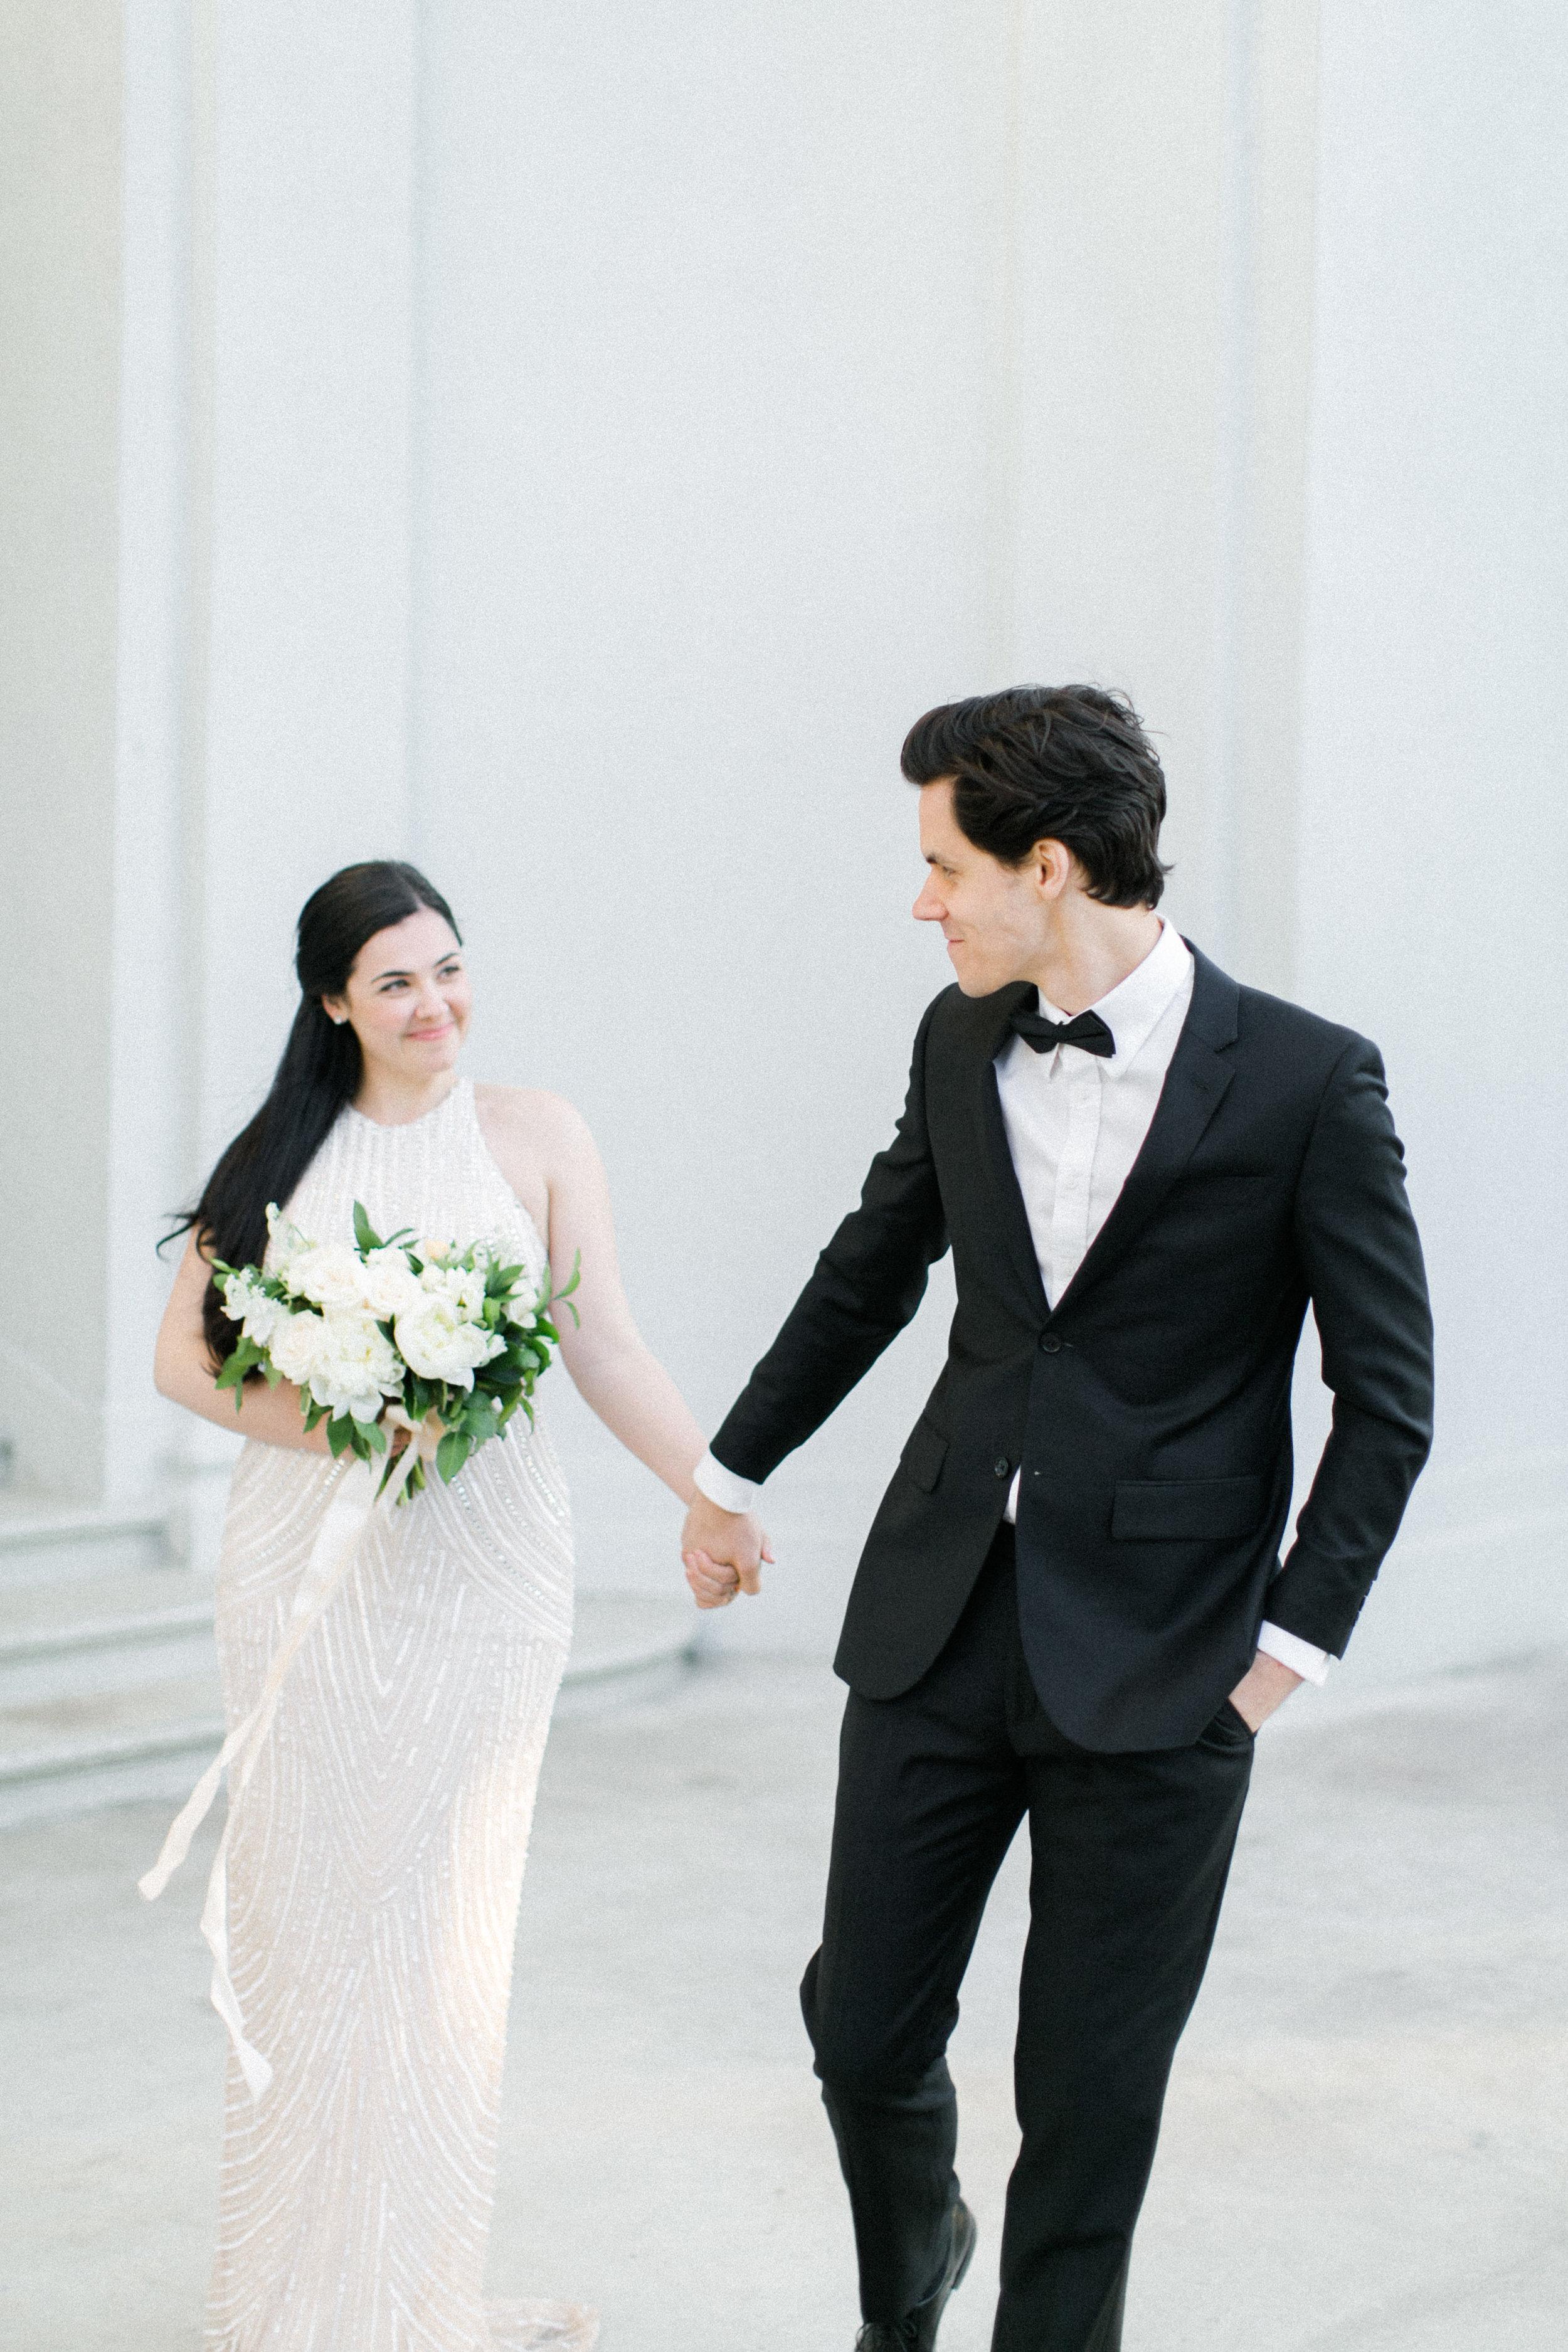 graydon-hall-toronto-ontario-high-end-wedding-photographer-richelle-hunter-bryce-hunter-sarah-hunter-anniversary-4.jpg